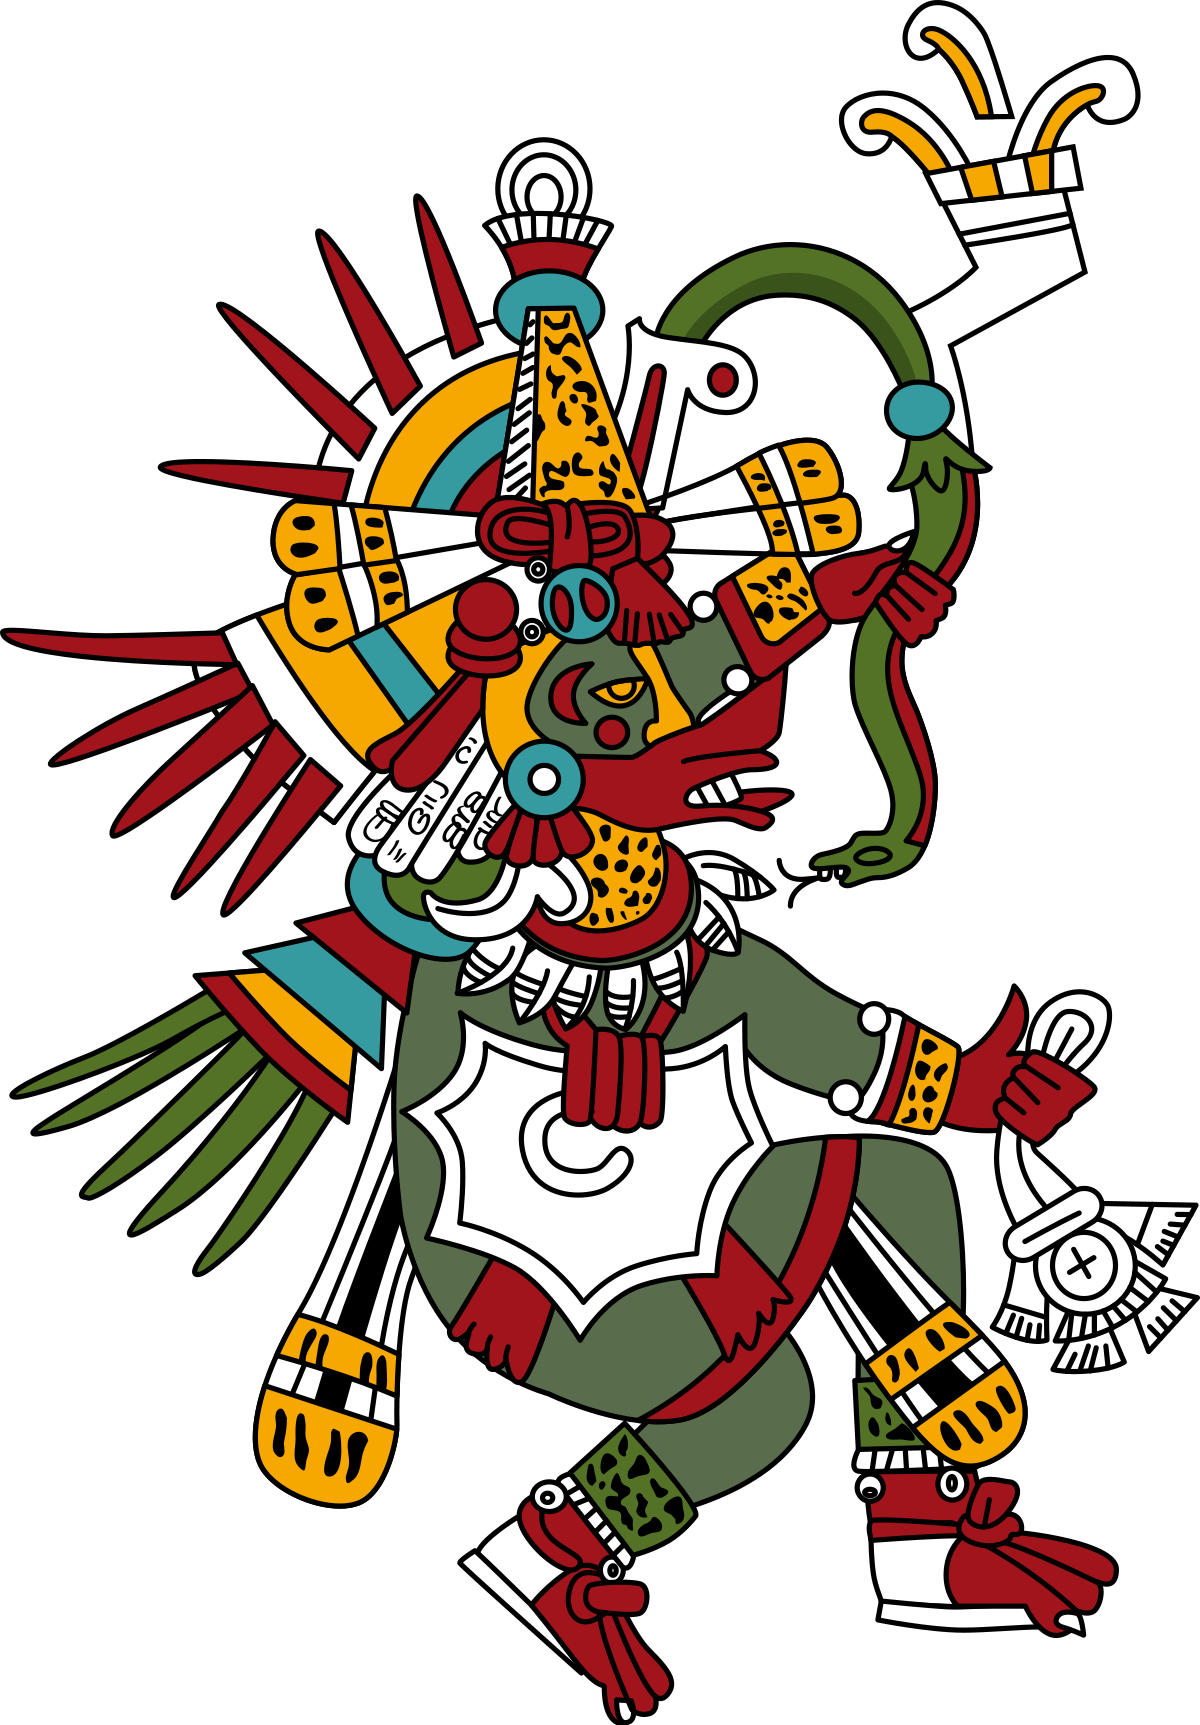 Quetzalcoatl wikipedia . Creation clipart creator god